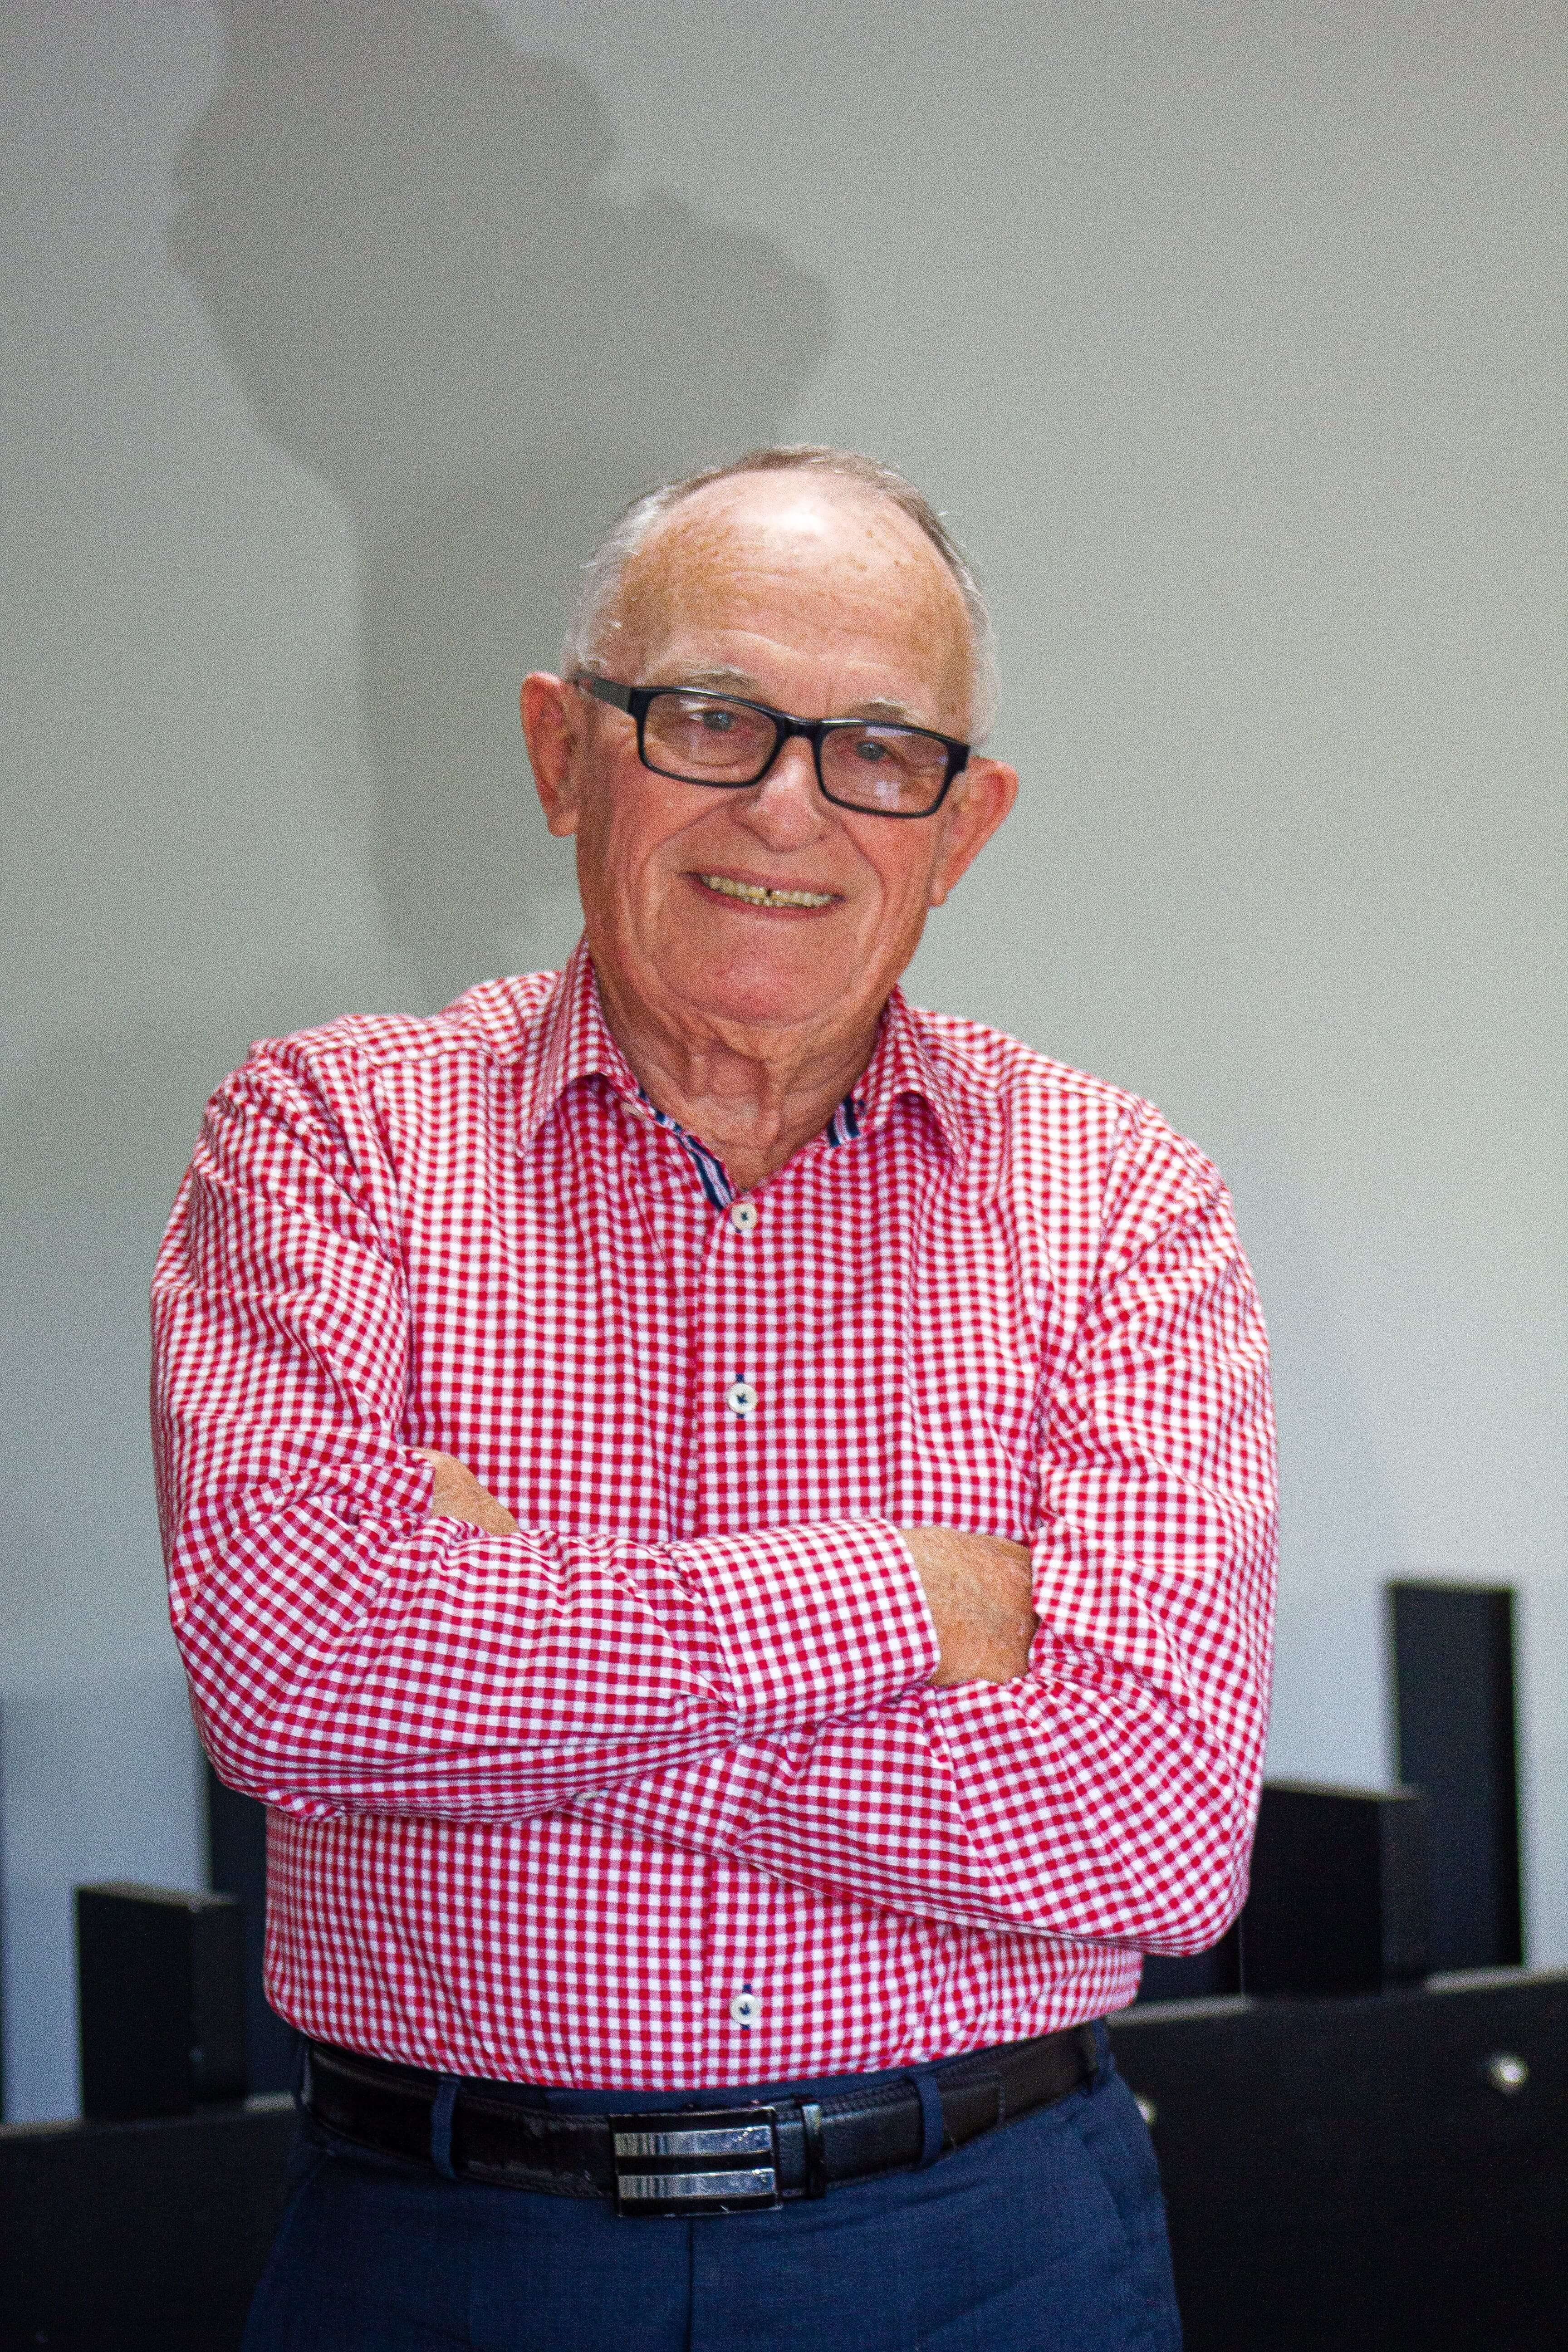 Keith Norris